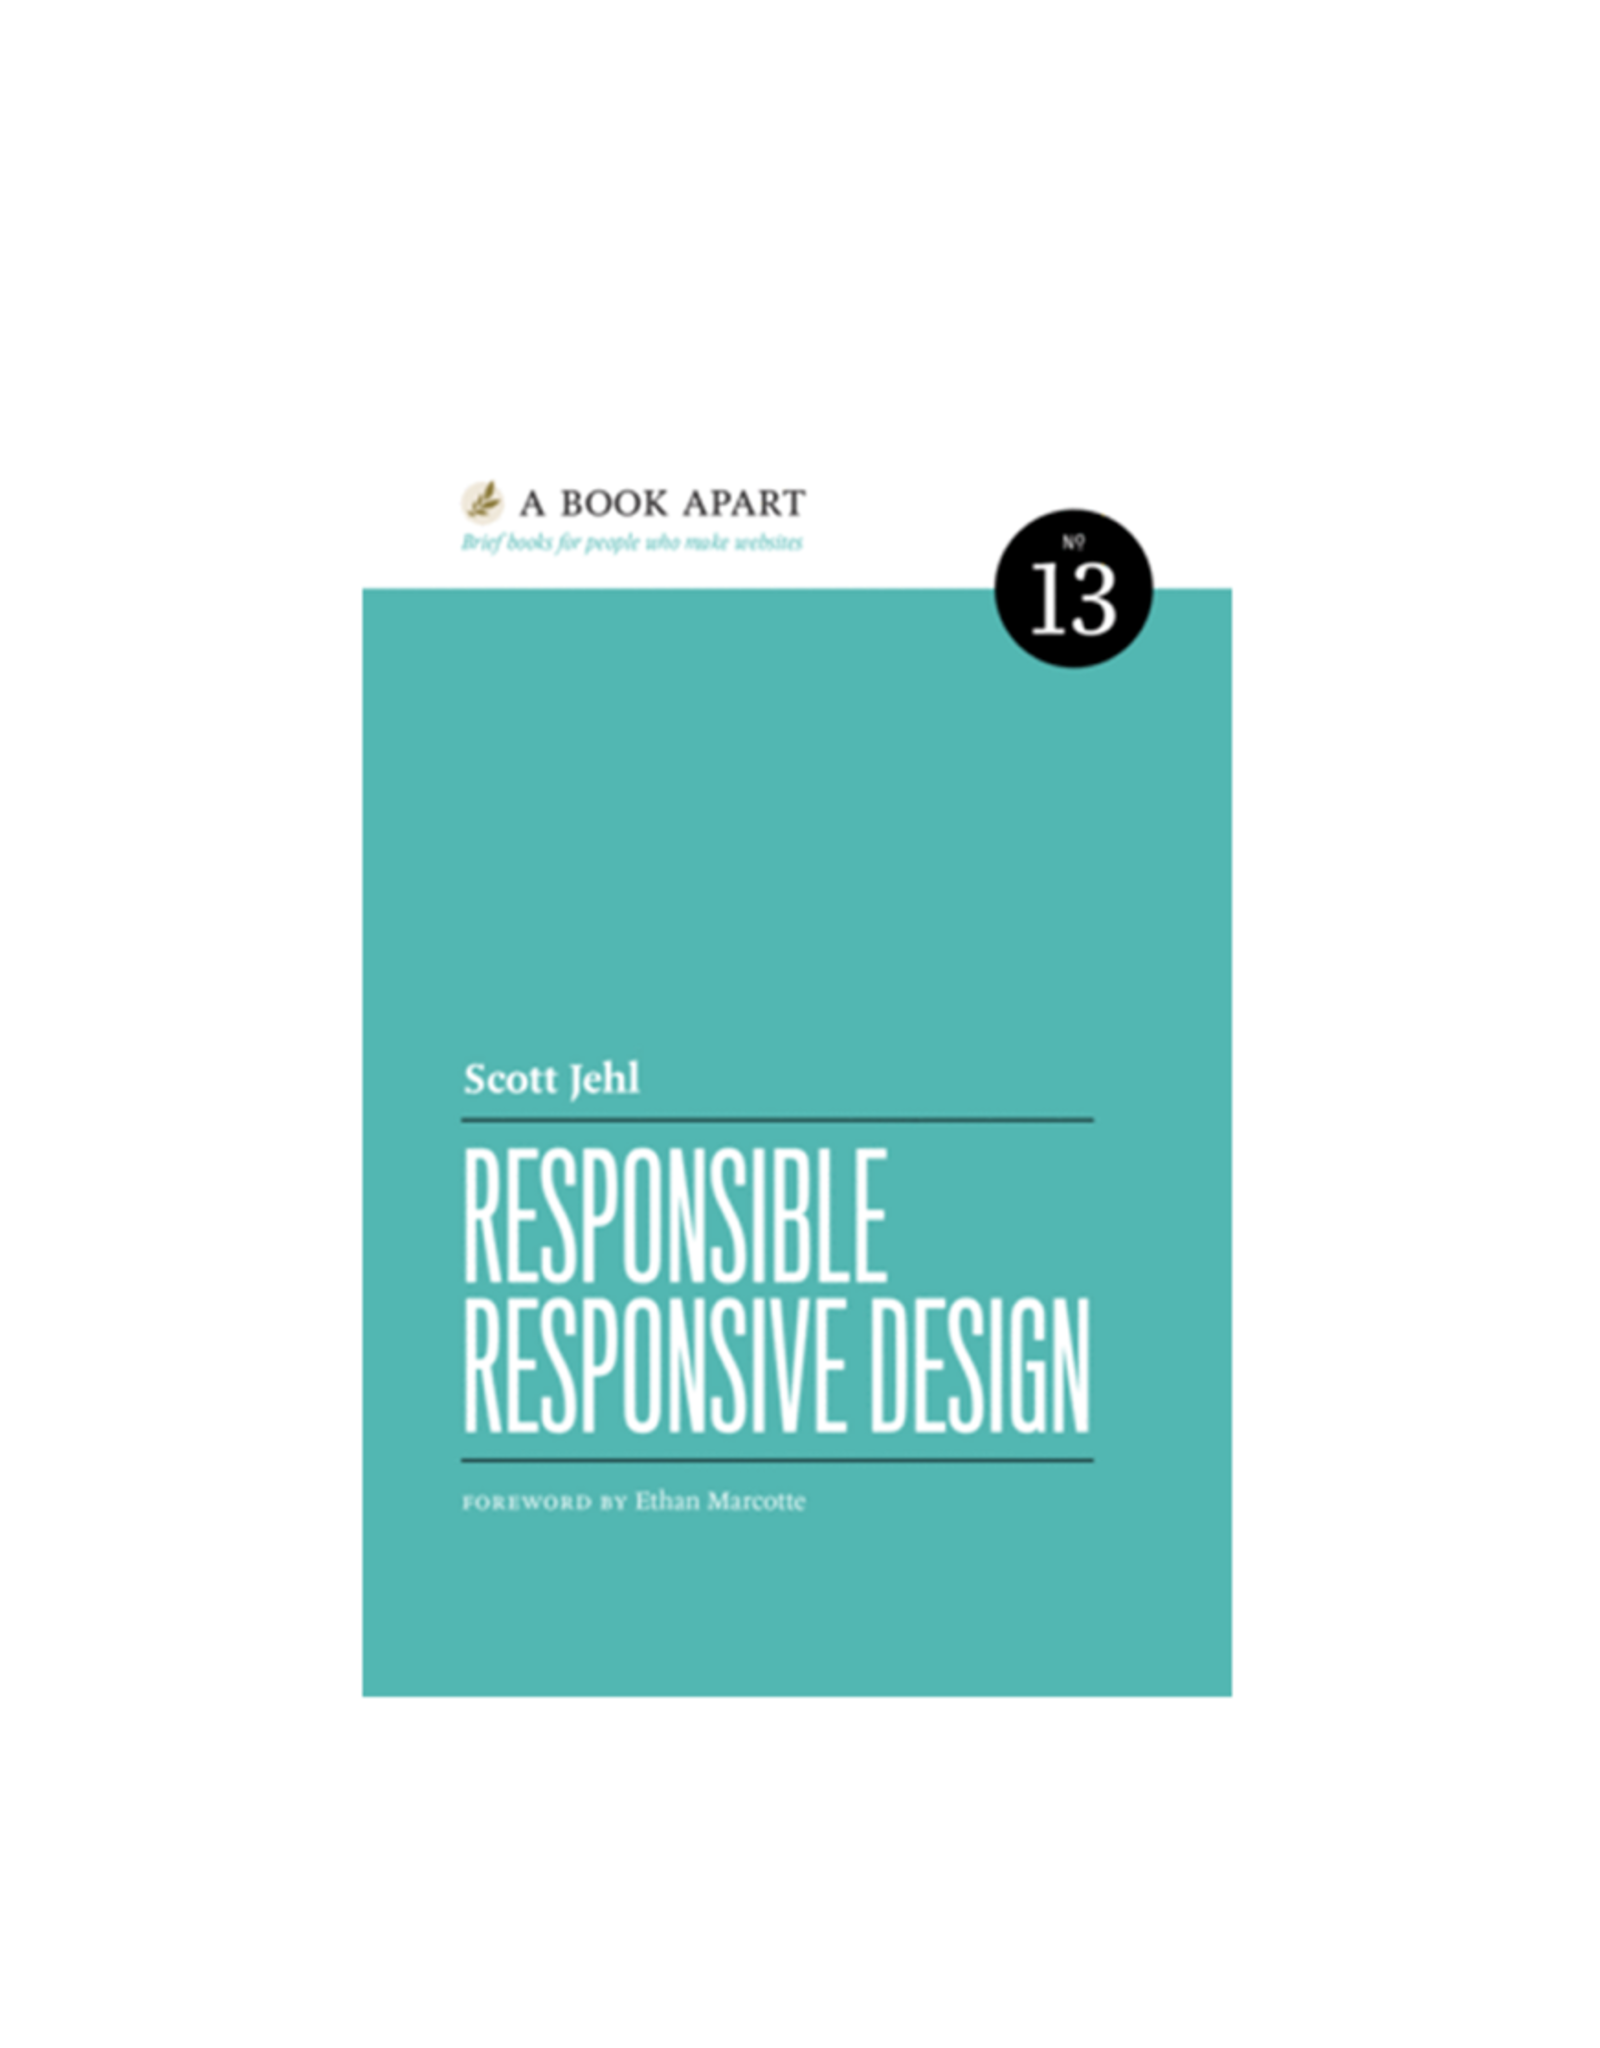 A Book Apart: Responsible Responsive Design (No. 13)